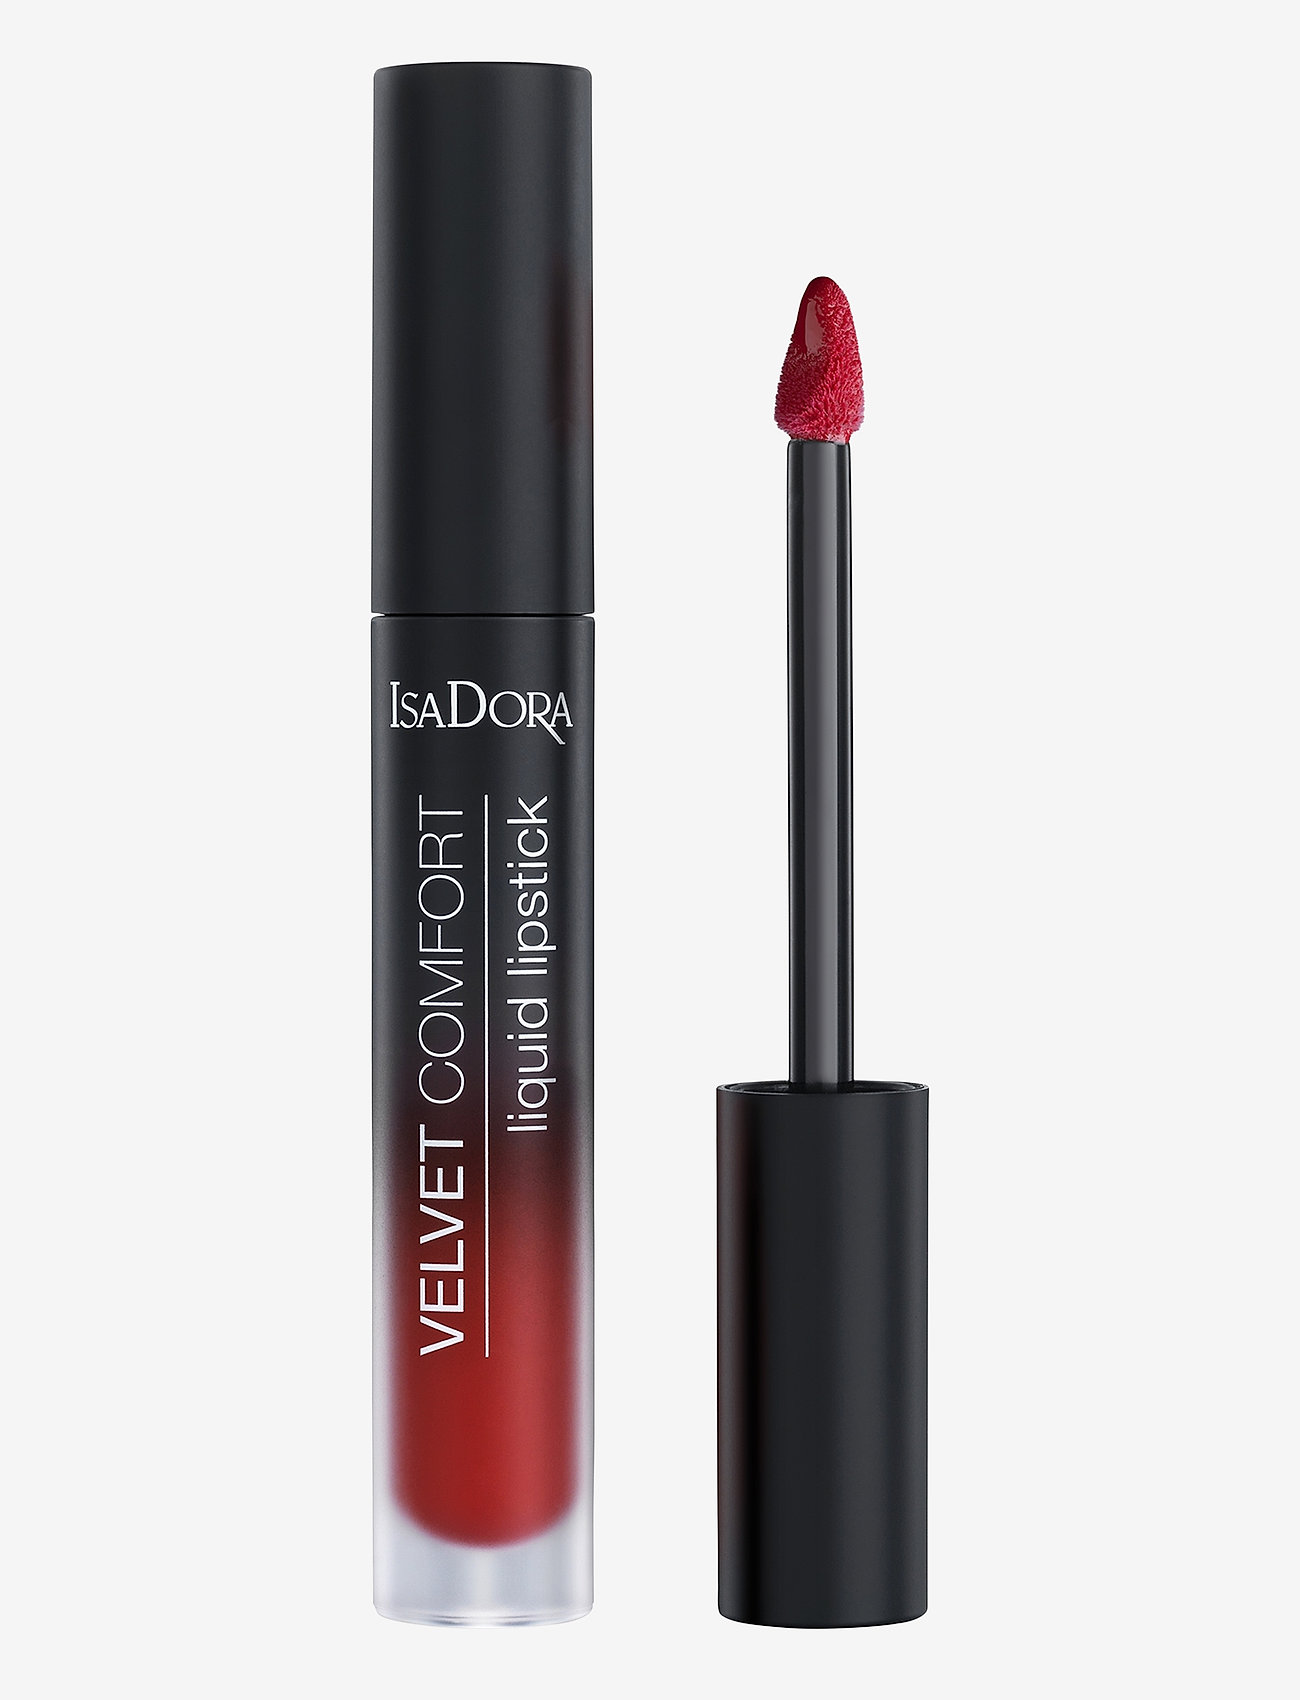 Isadora - Velvet Comfort Liquid Lipstick Ravish Red - liquid lipstick - ravish red - 1